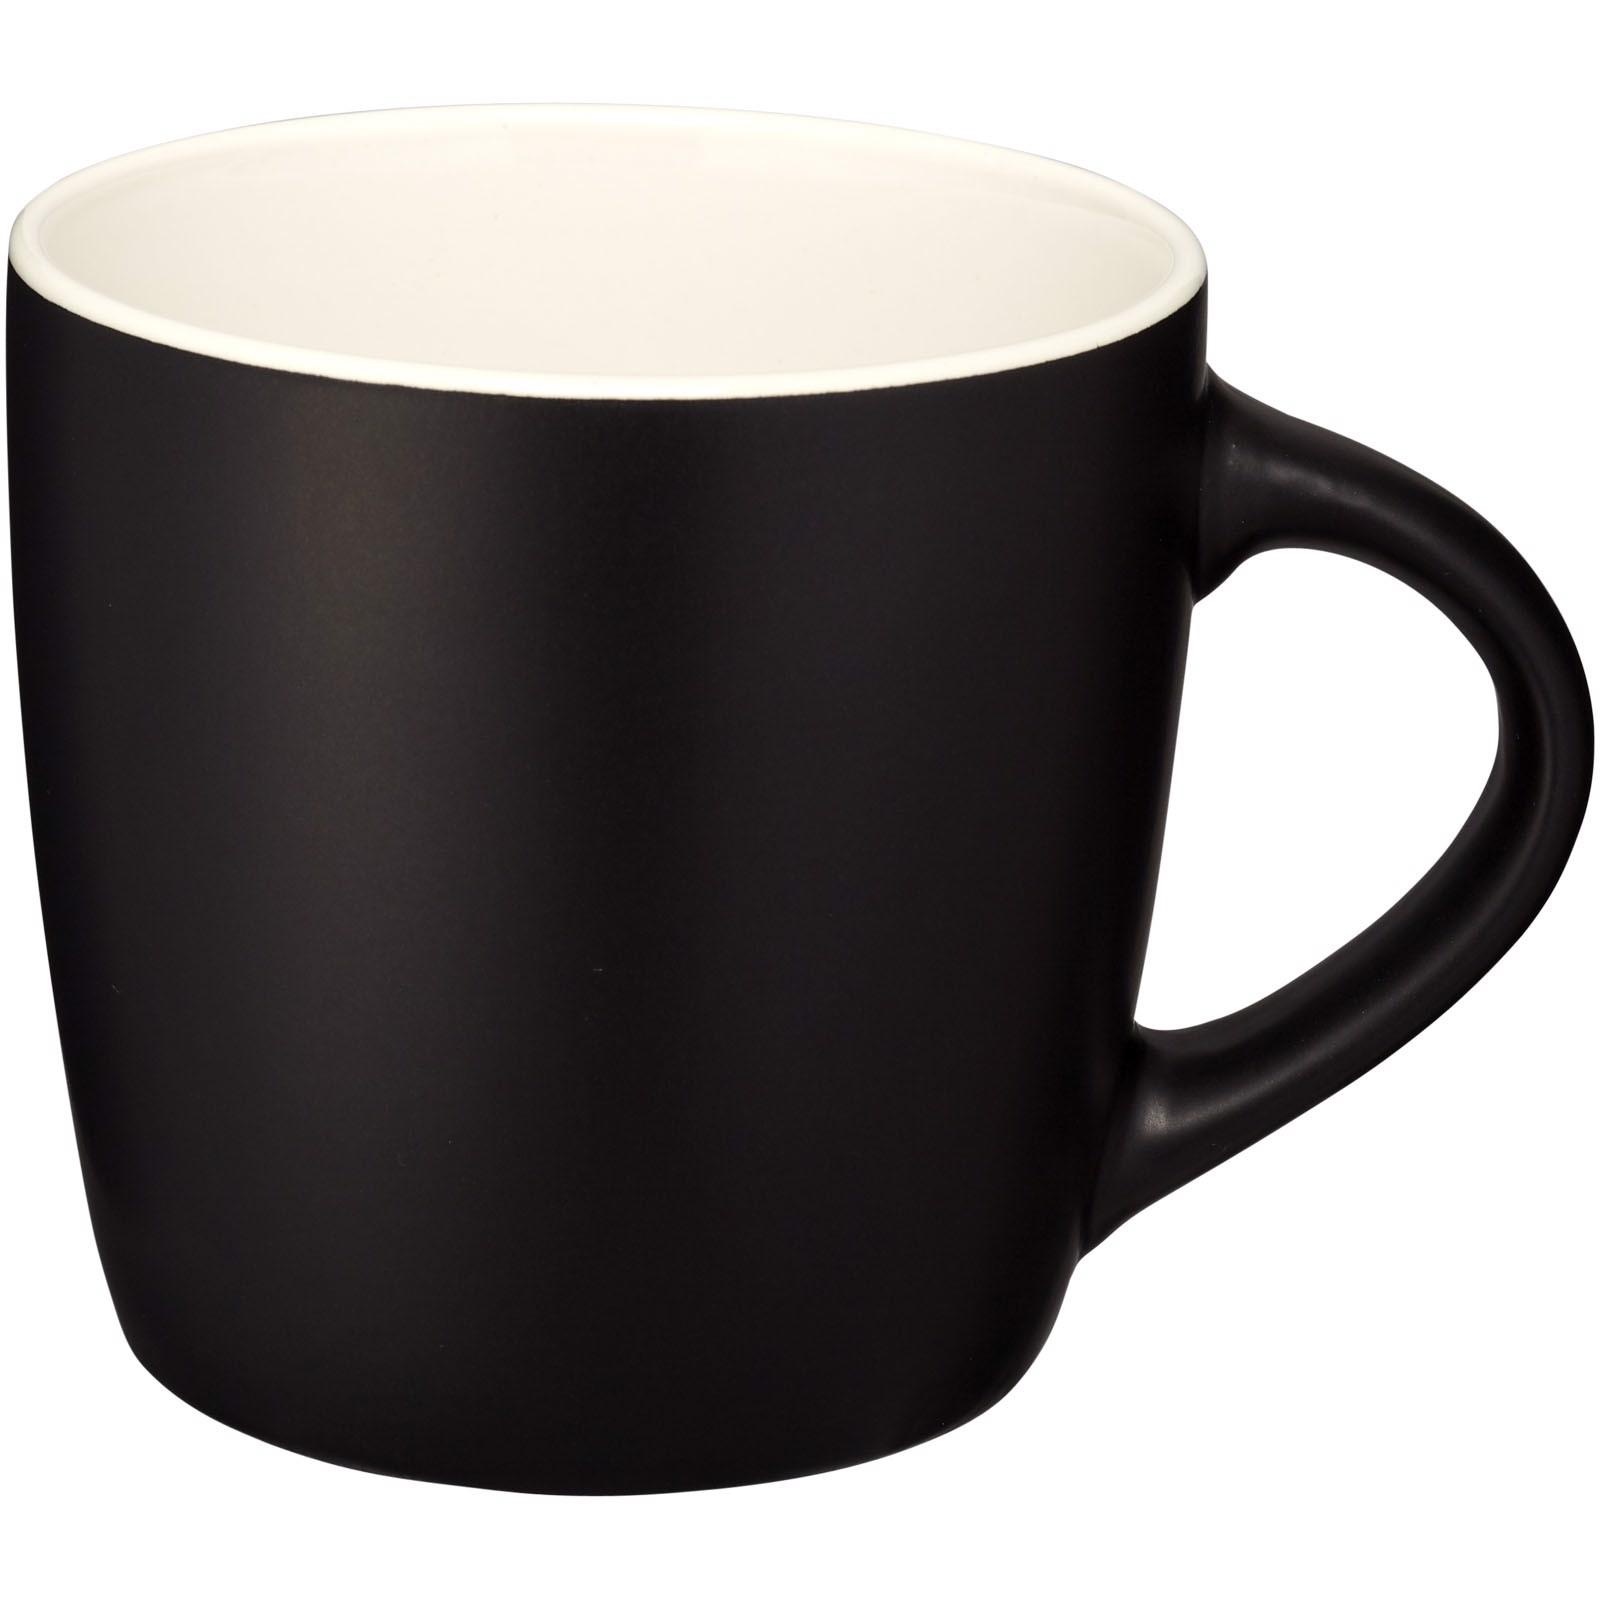 Riviera 340 ml ceramic mug - Solid Black / White